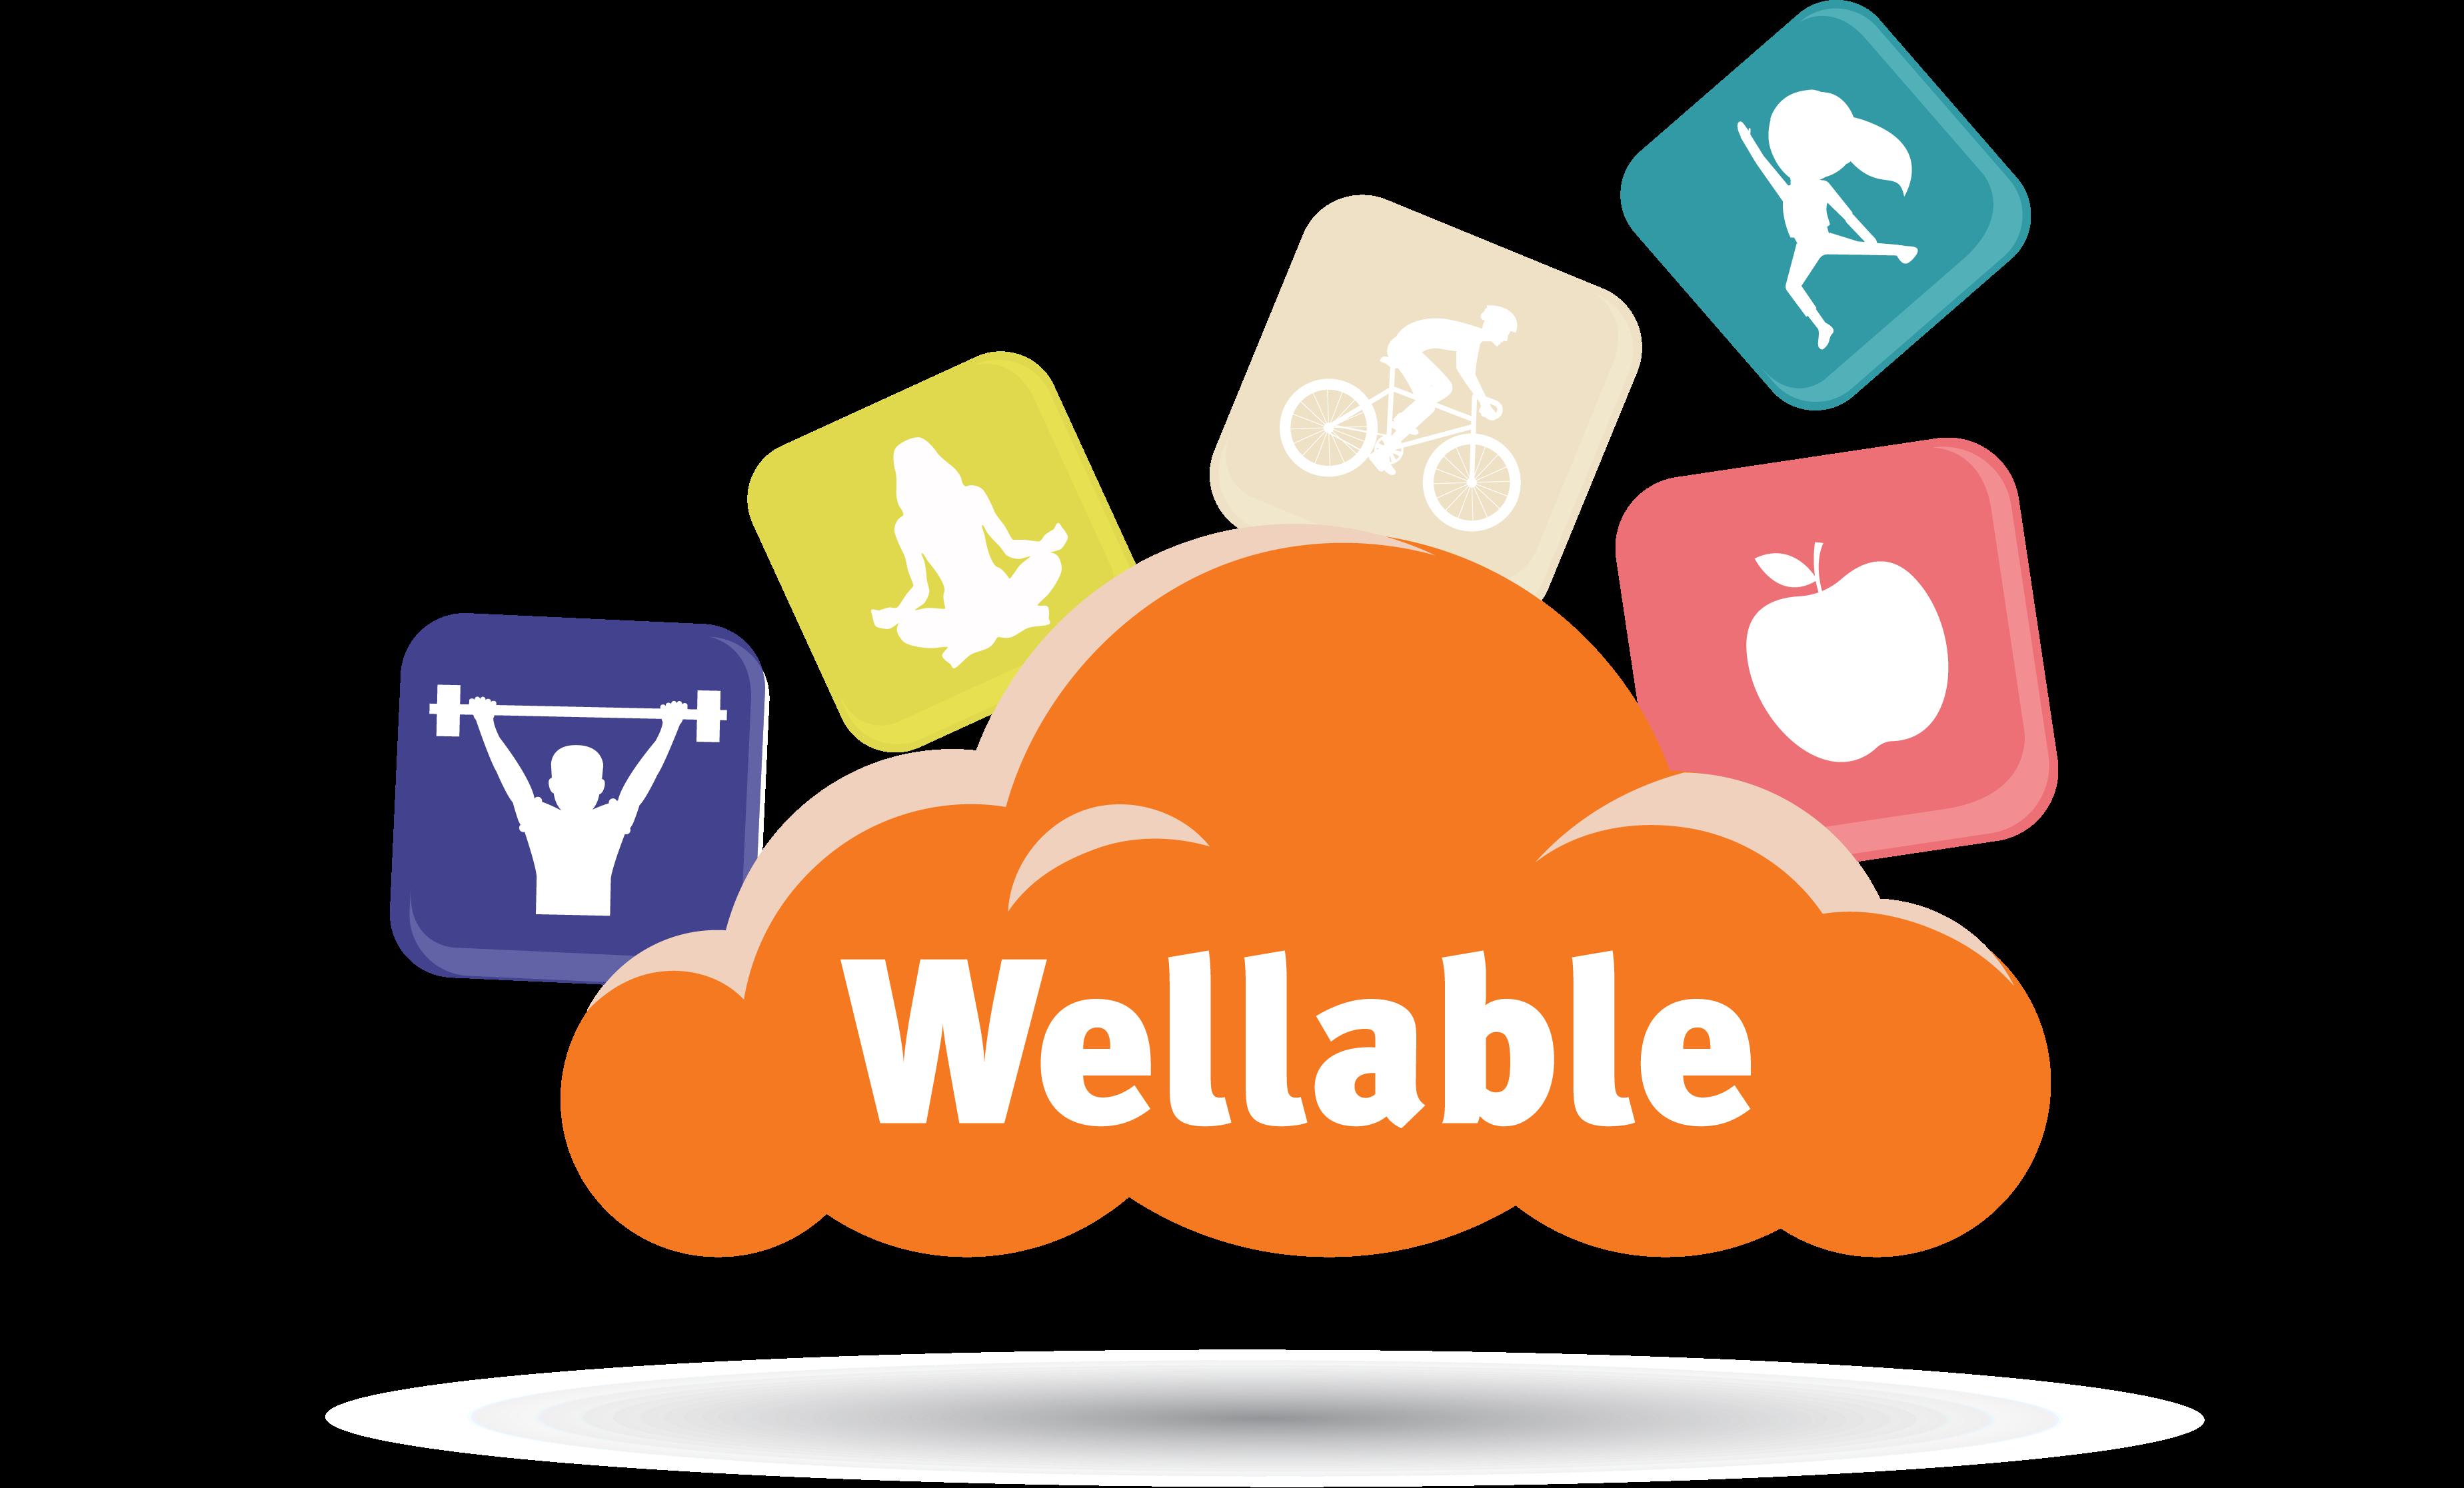 Wellable employee wellness platform